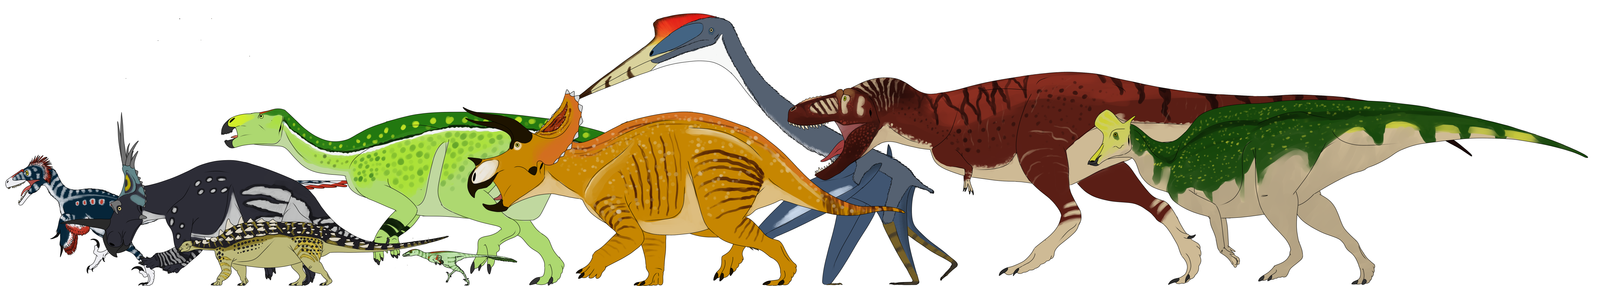 Primal Prey By StygimolochSpinifer On DeviantArt